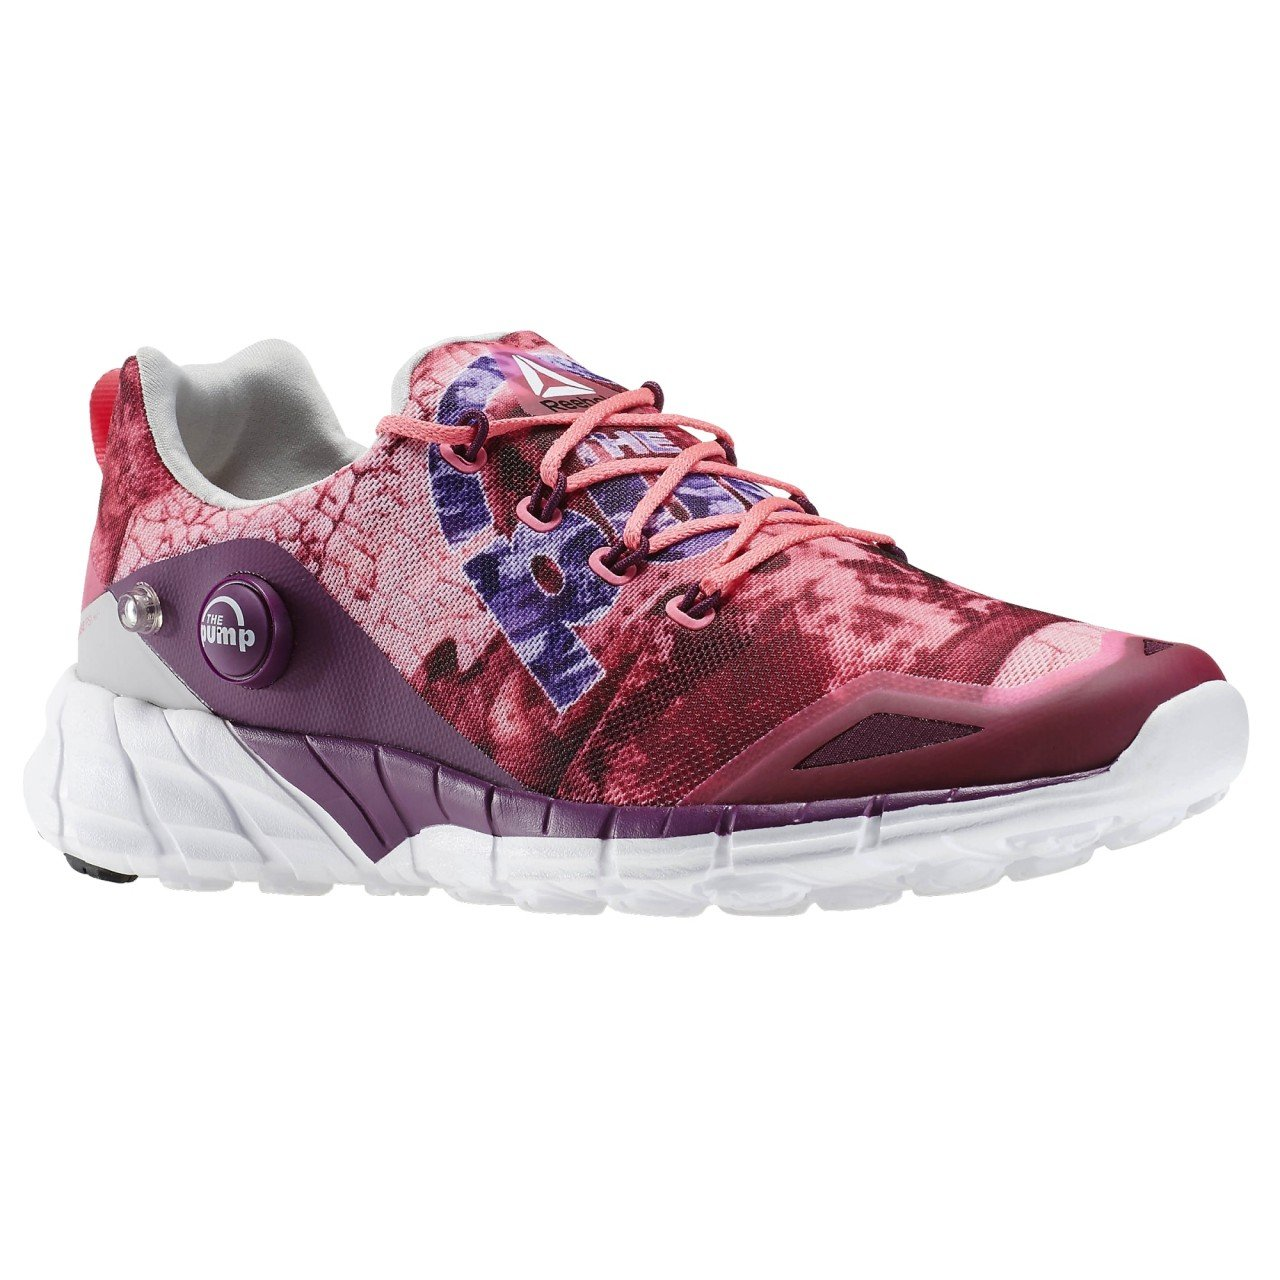 Reebok Damen V72626_38 Running Shoes, red, EU